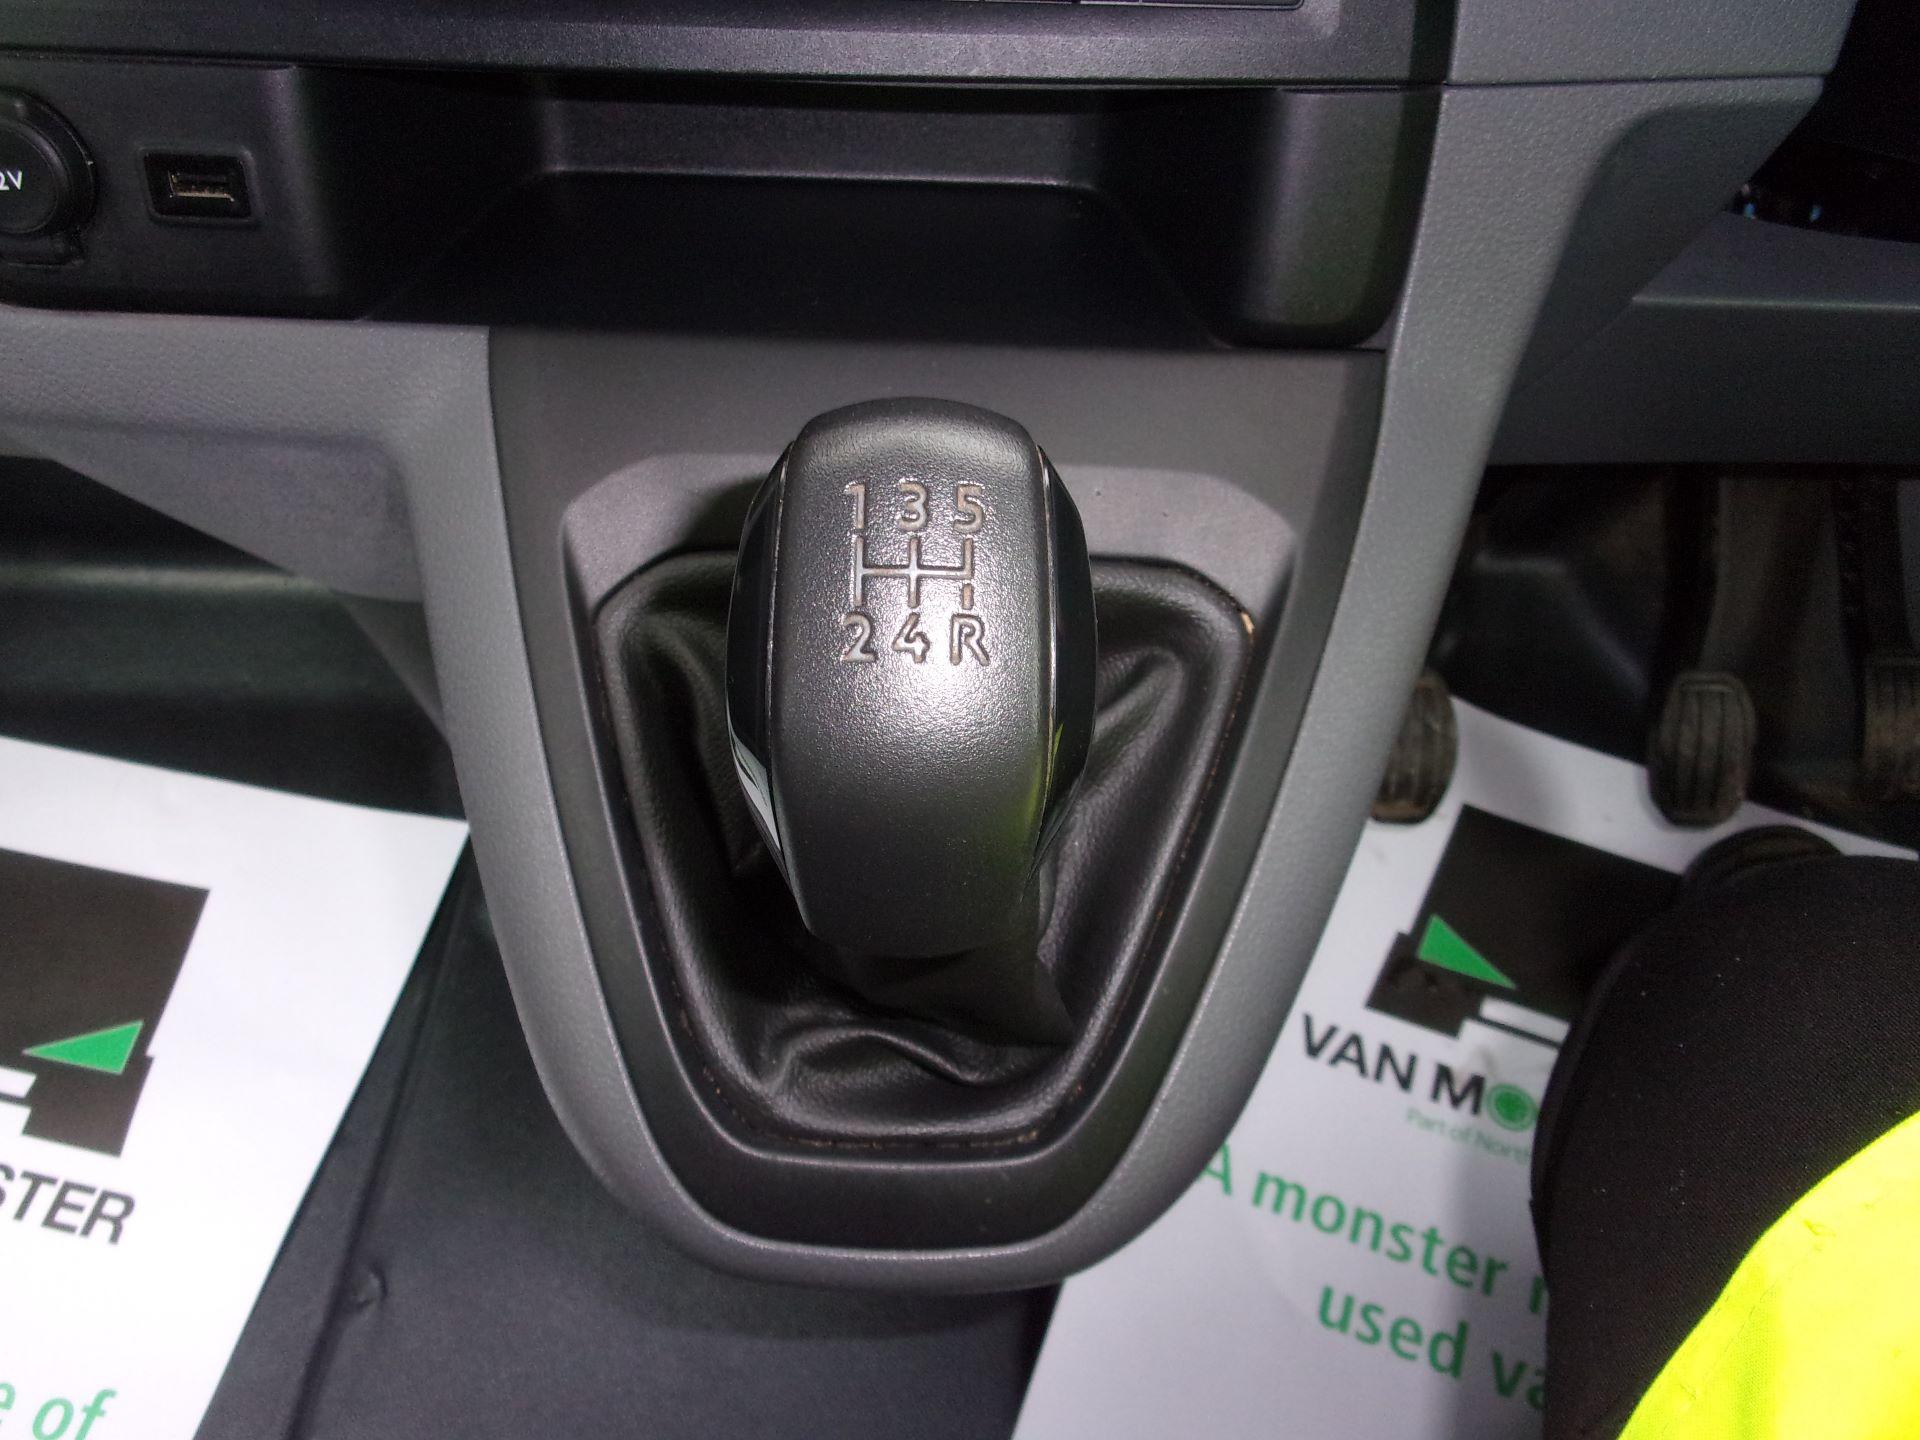 2018 Peugeot Expert STANDARD 1000 1.6 BLUEHDI 95 PS PROFESSIONAL EURO 6 (NU18VVY) Image 3